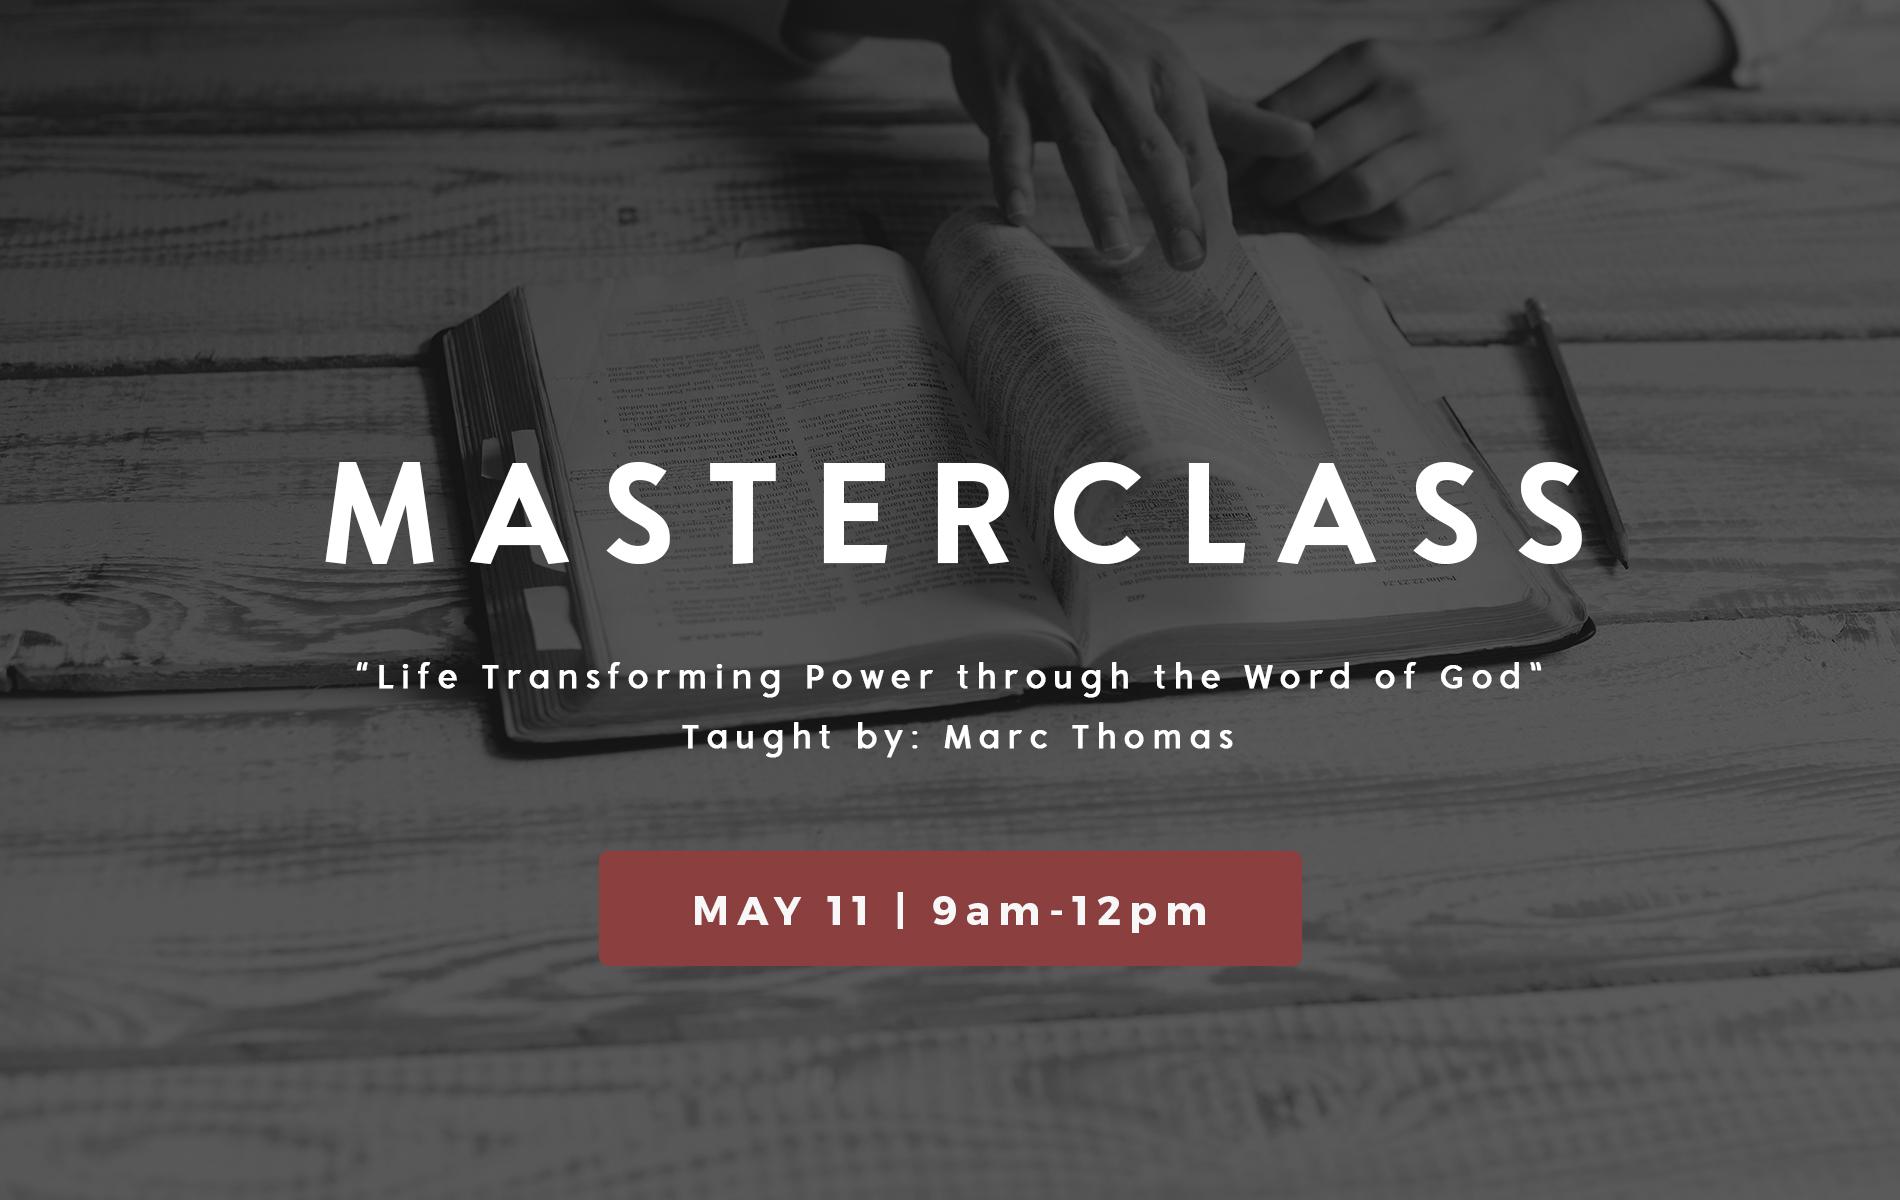 may11_masterclass_slide.jpg